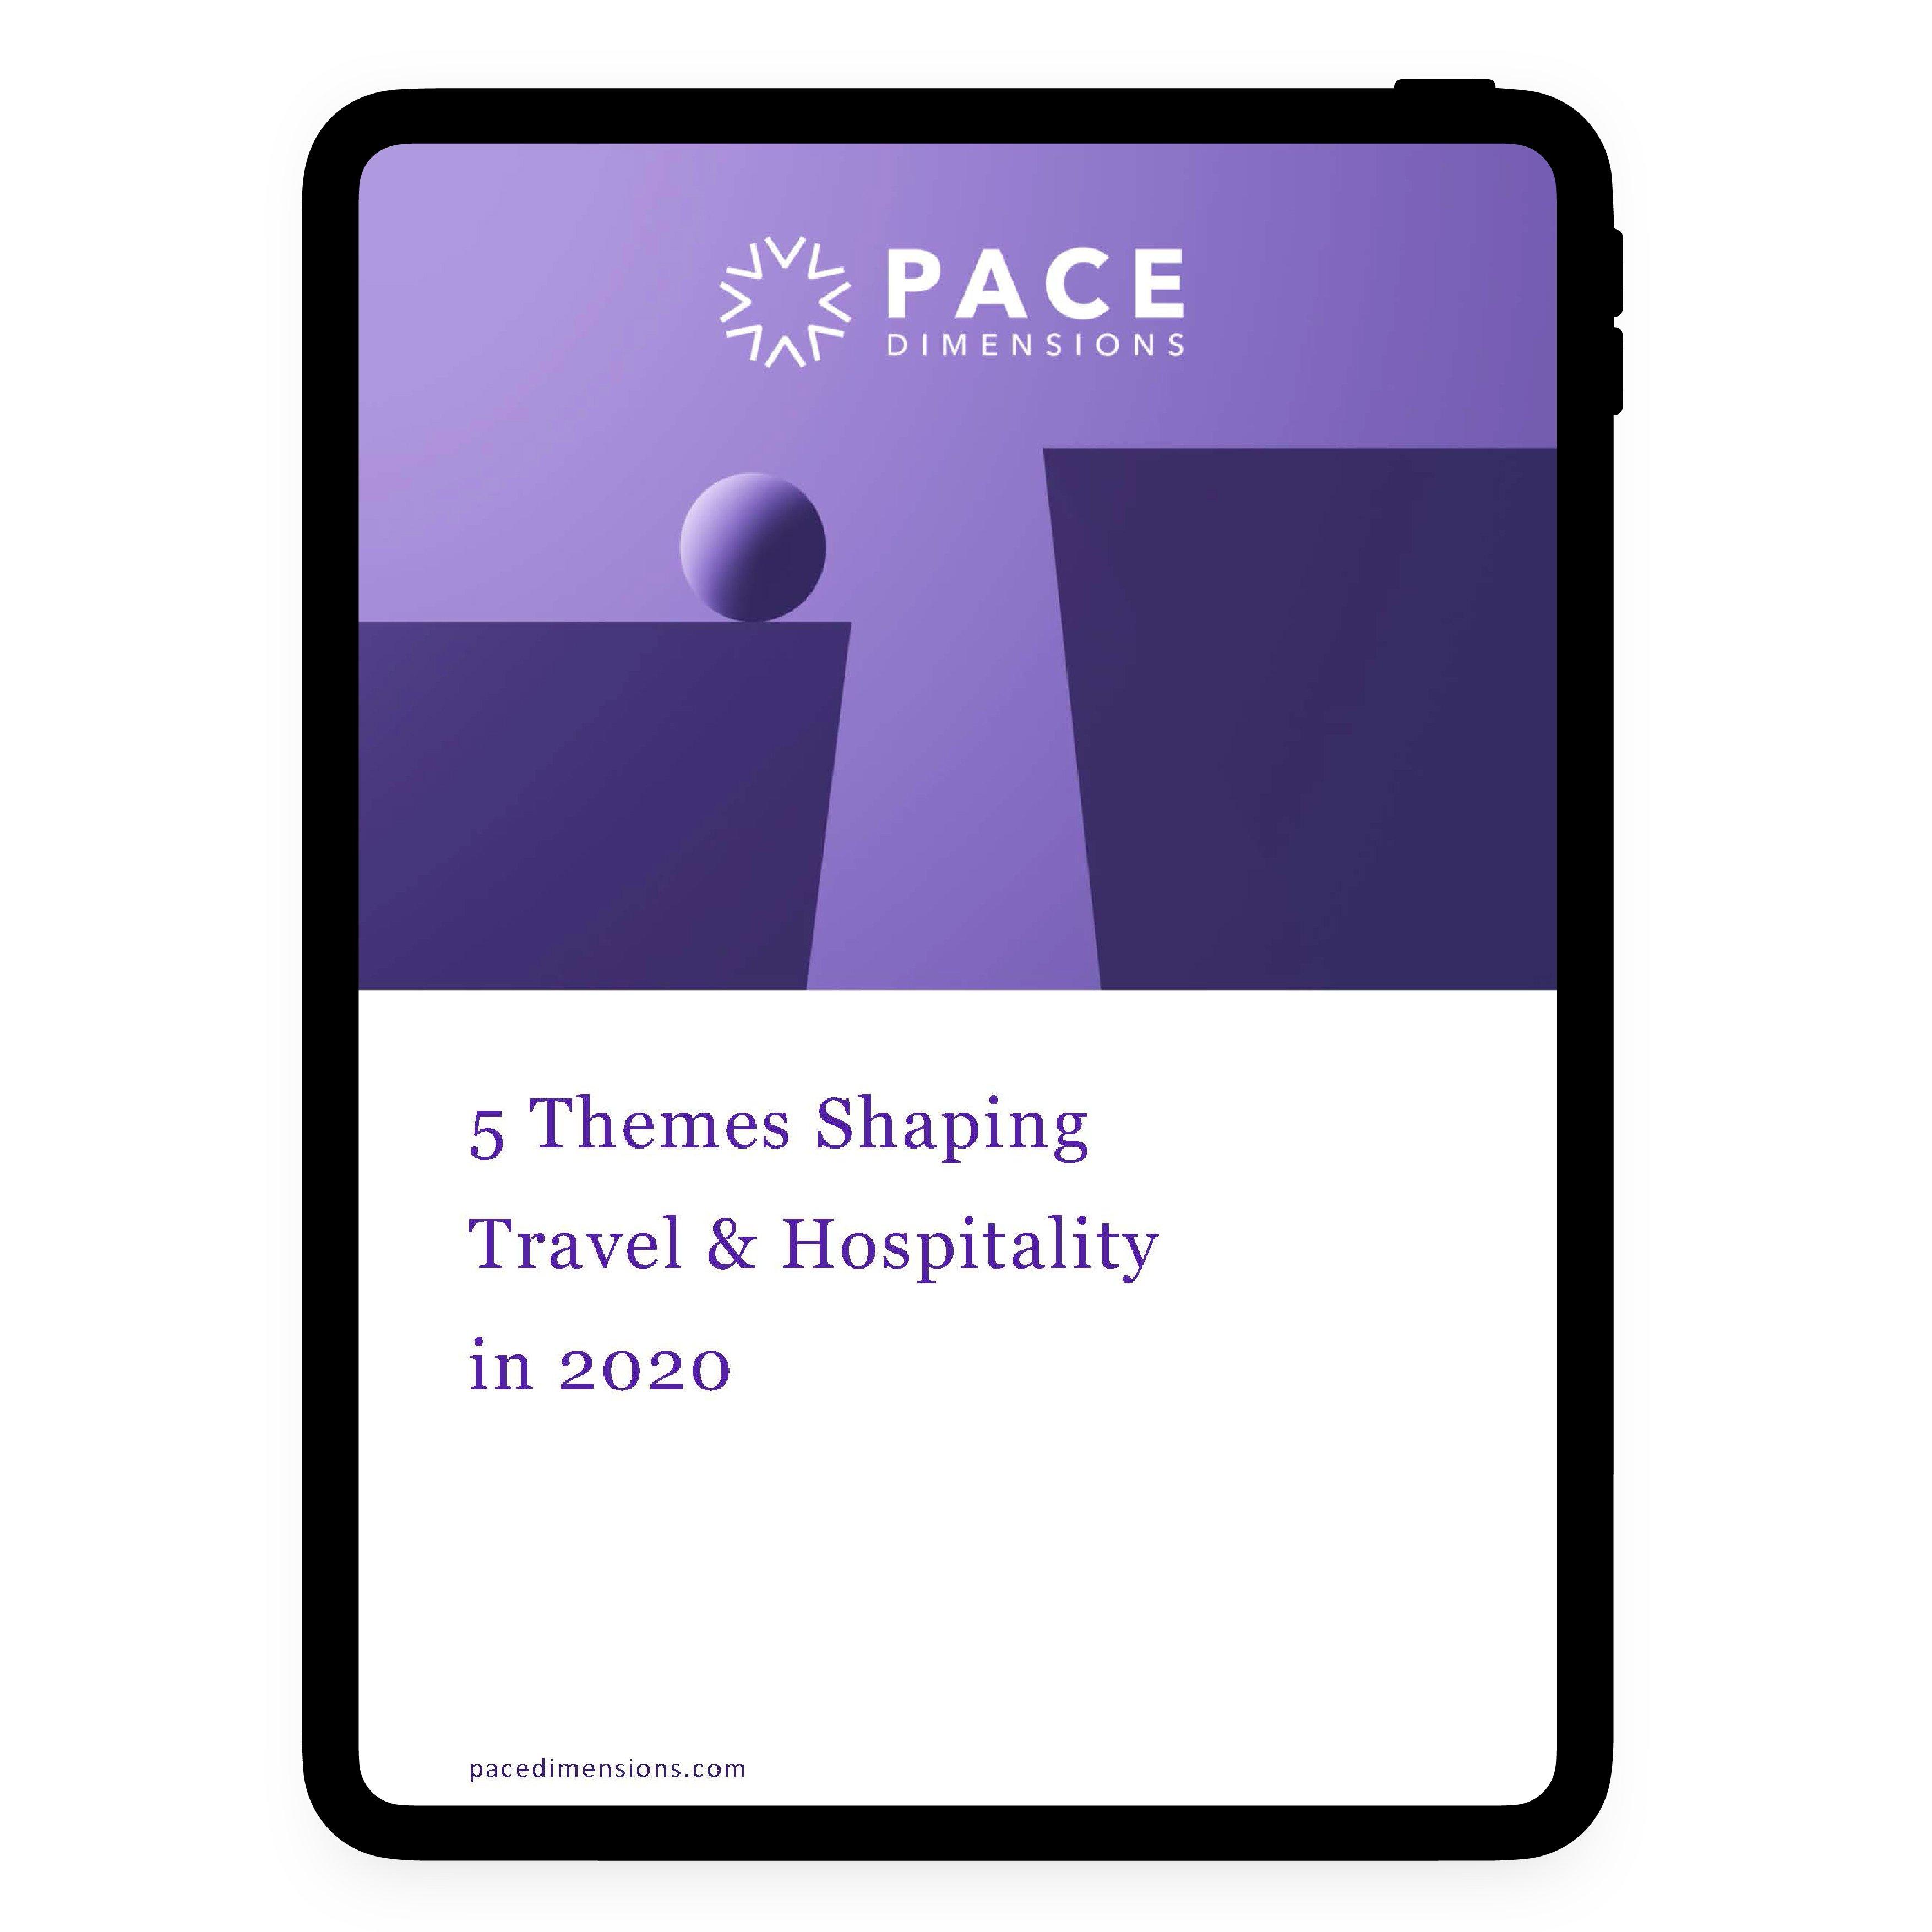 5-themes-shaping-travel-hospitality-2020-whitepaper